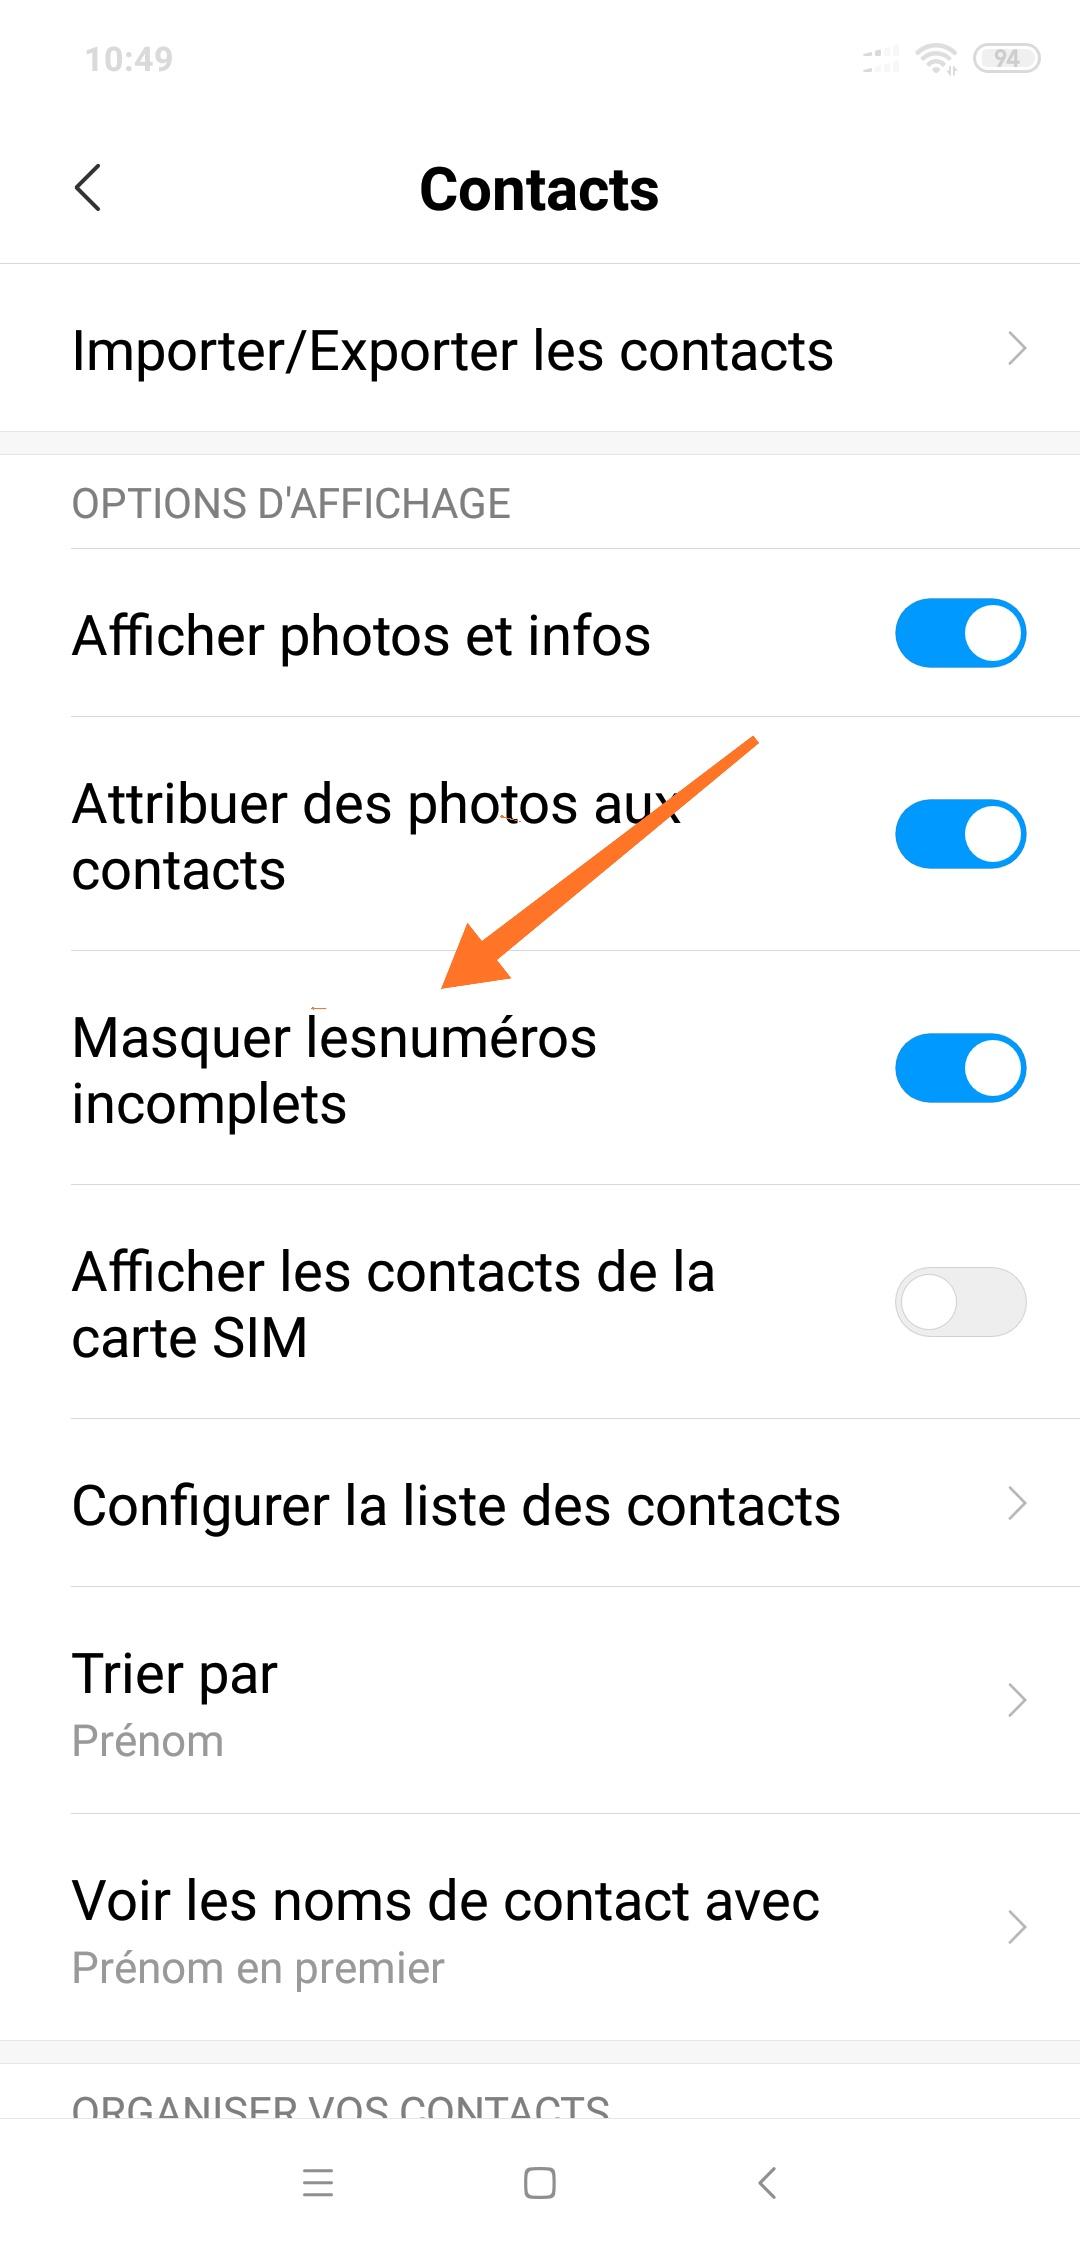 Screenshot_2018-08-18-10-49-47-685_com.android.contacts.jpg